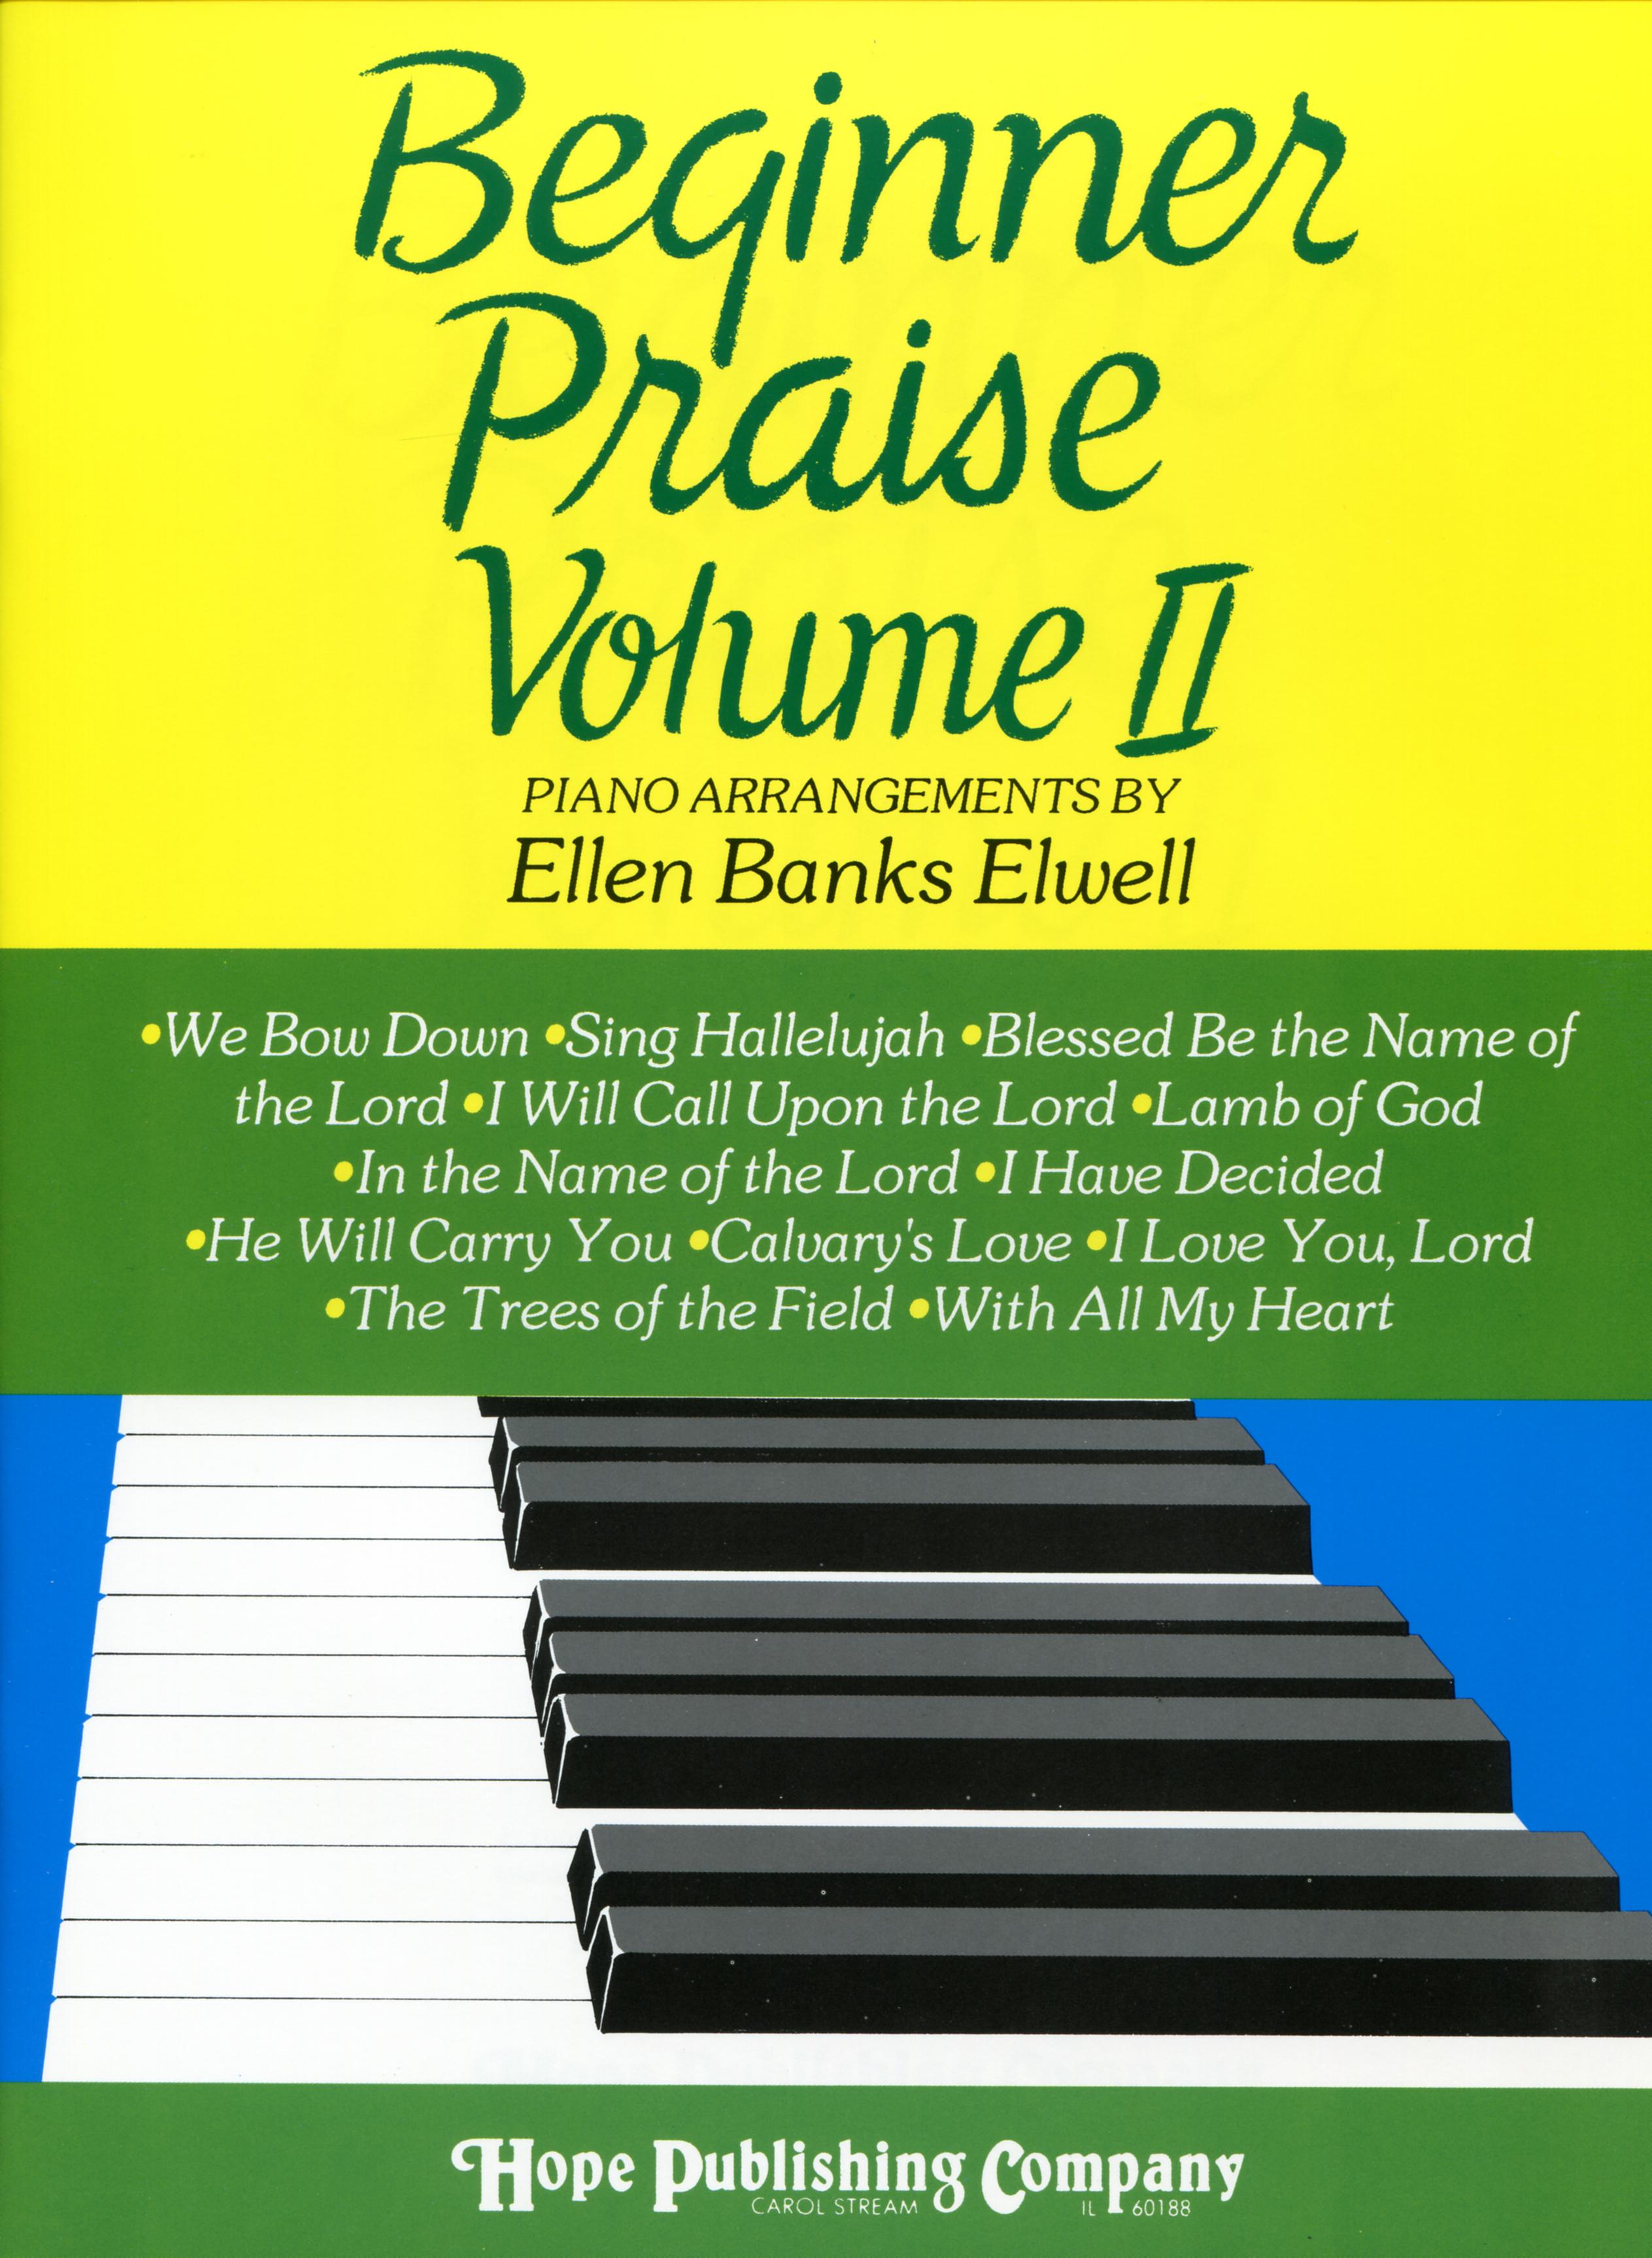 Beginner Praise Vol. II - Piano Cover Image